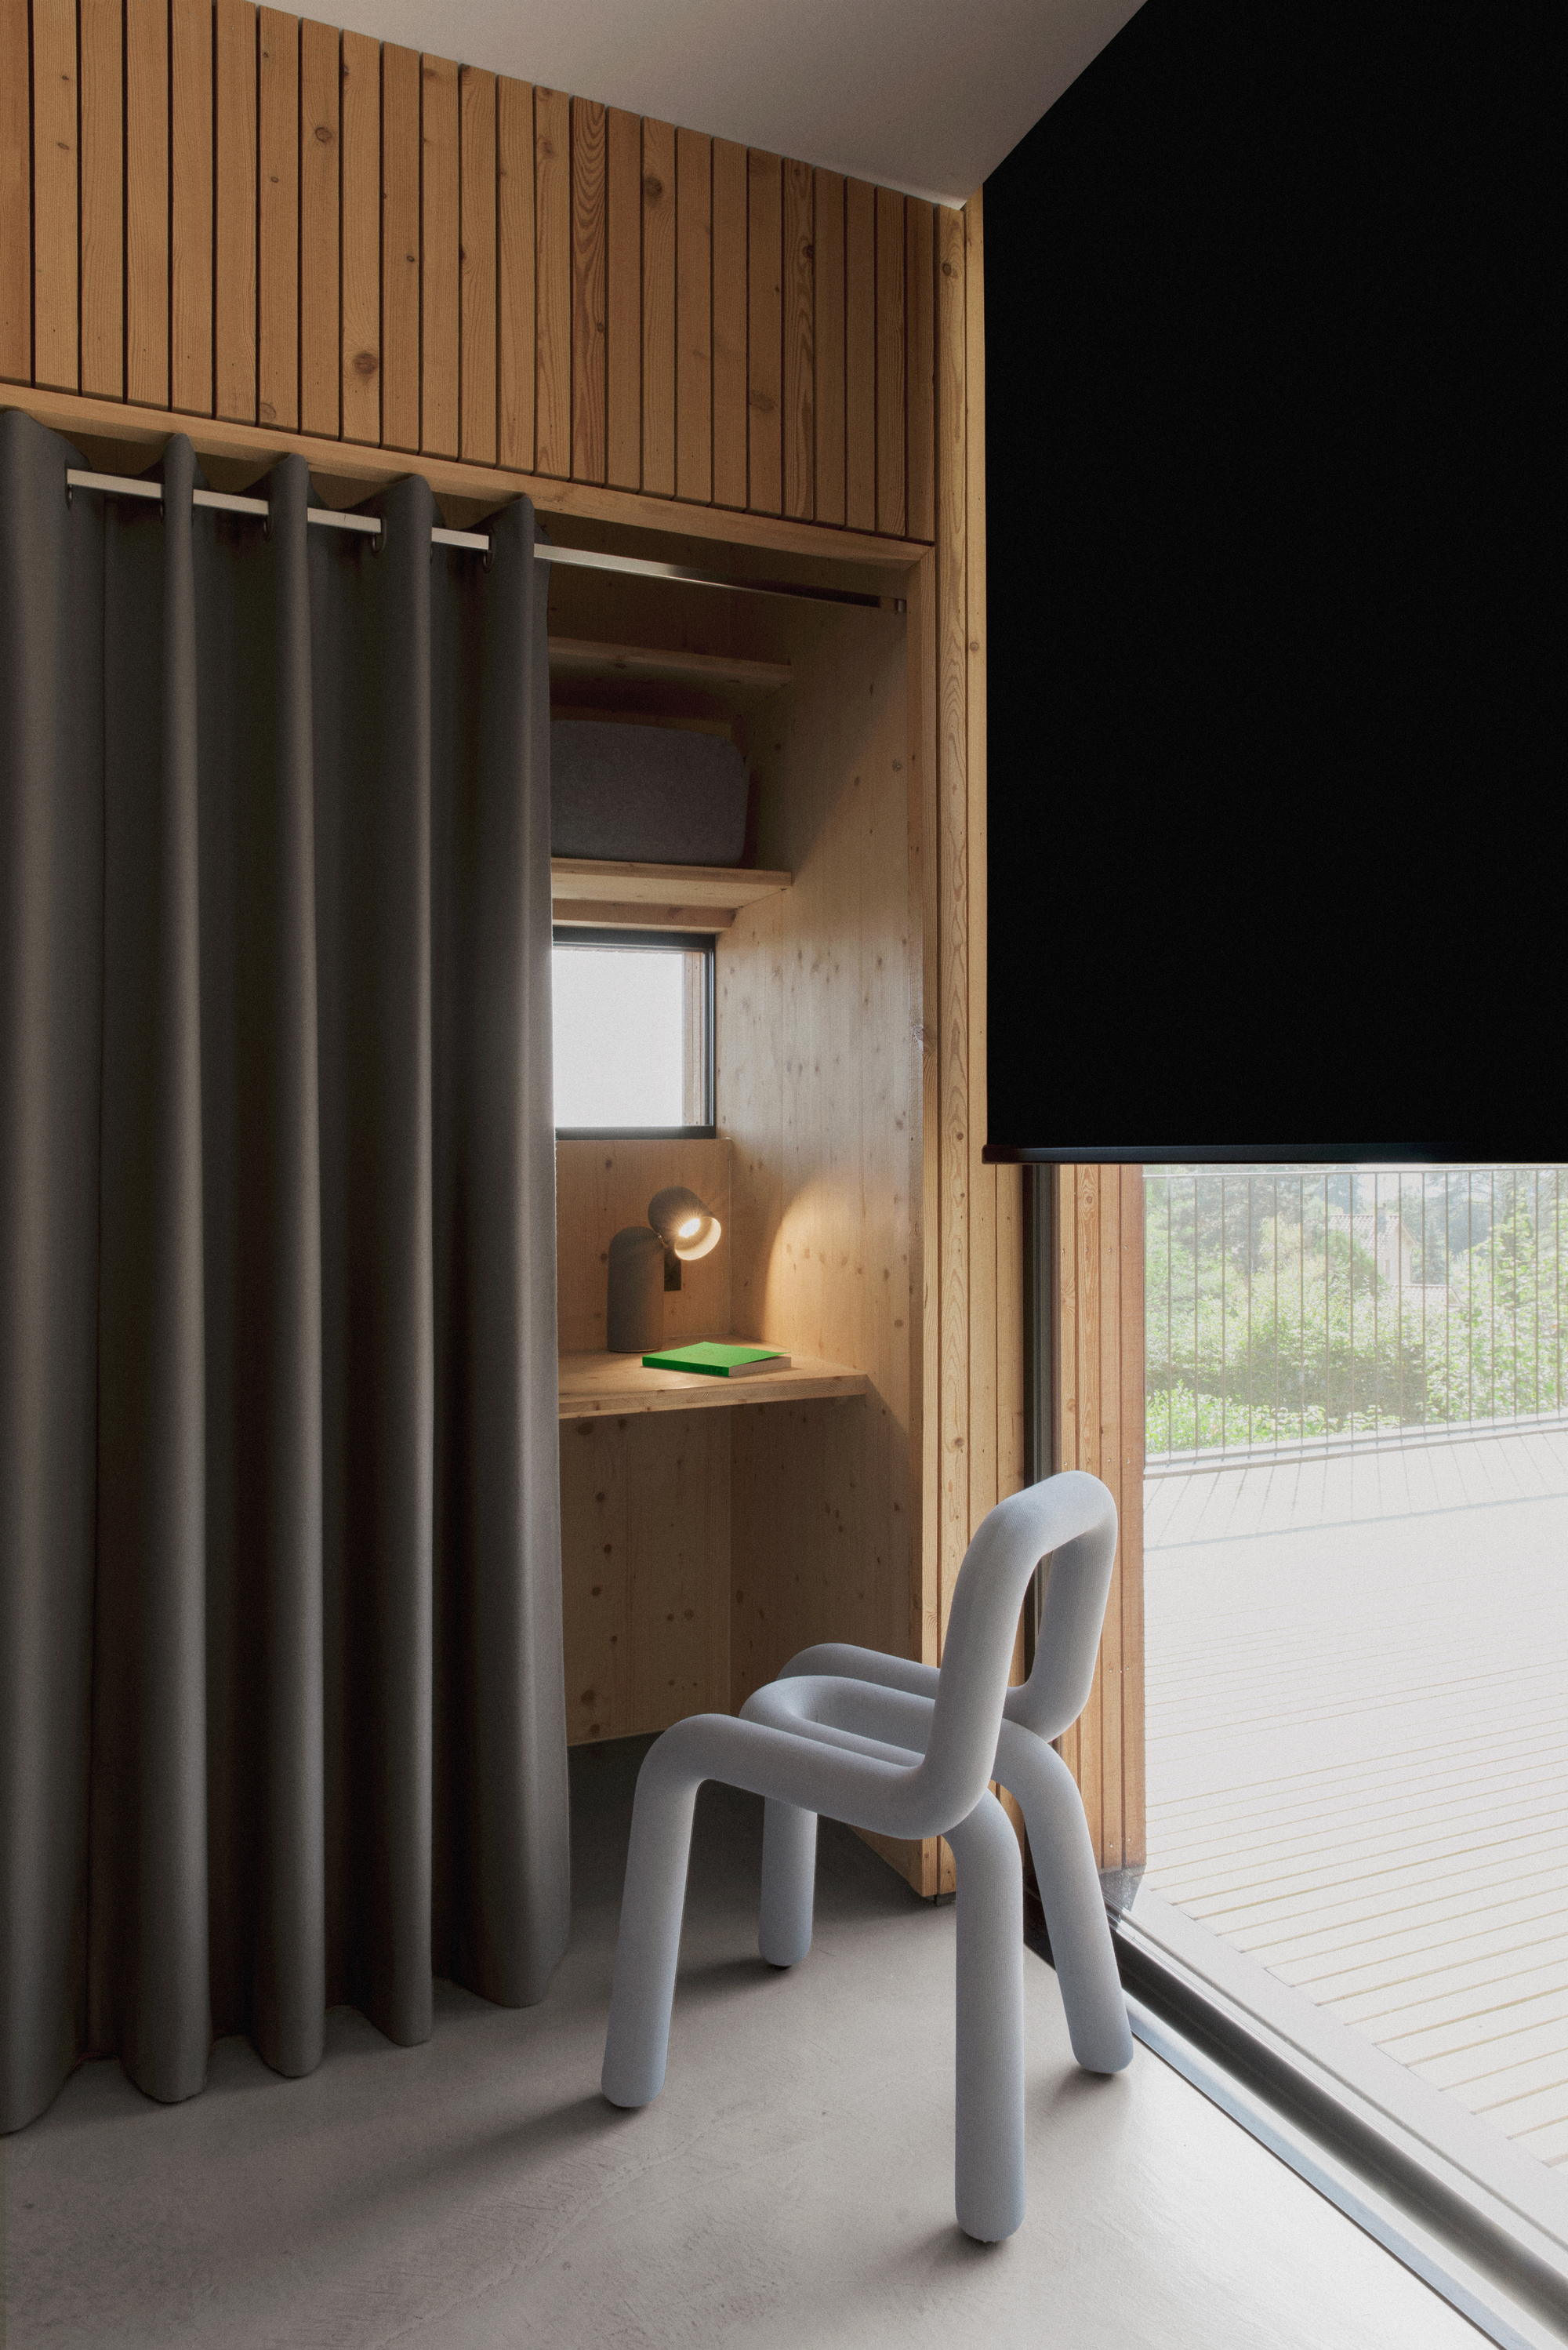 gallery of la maison etir e barres coquet 7. Black Bedroom Furniture Sets. Home Design Ideas